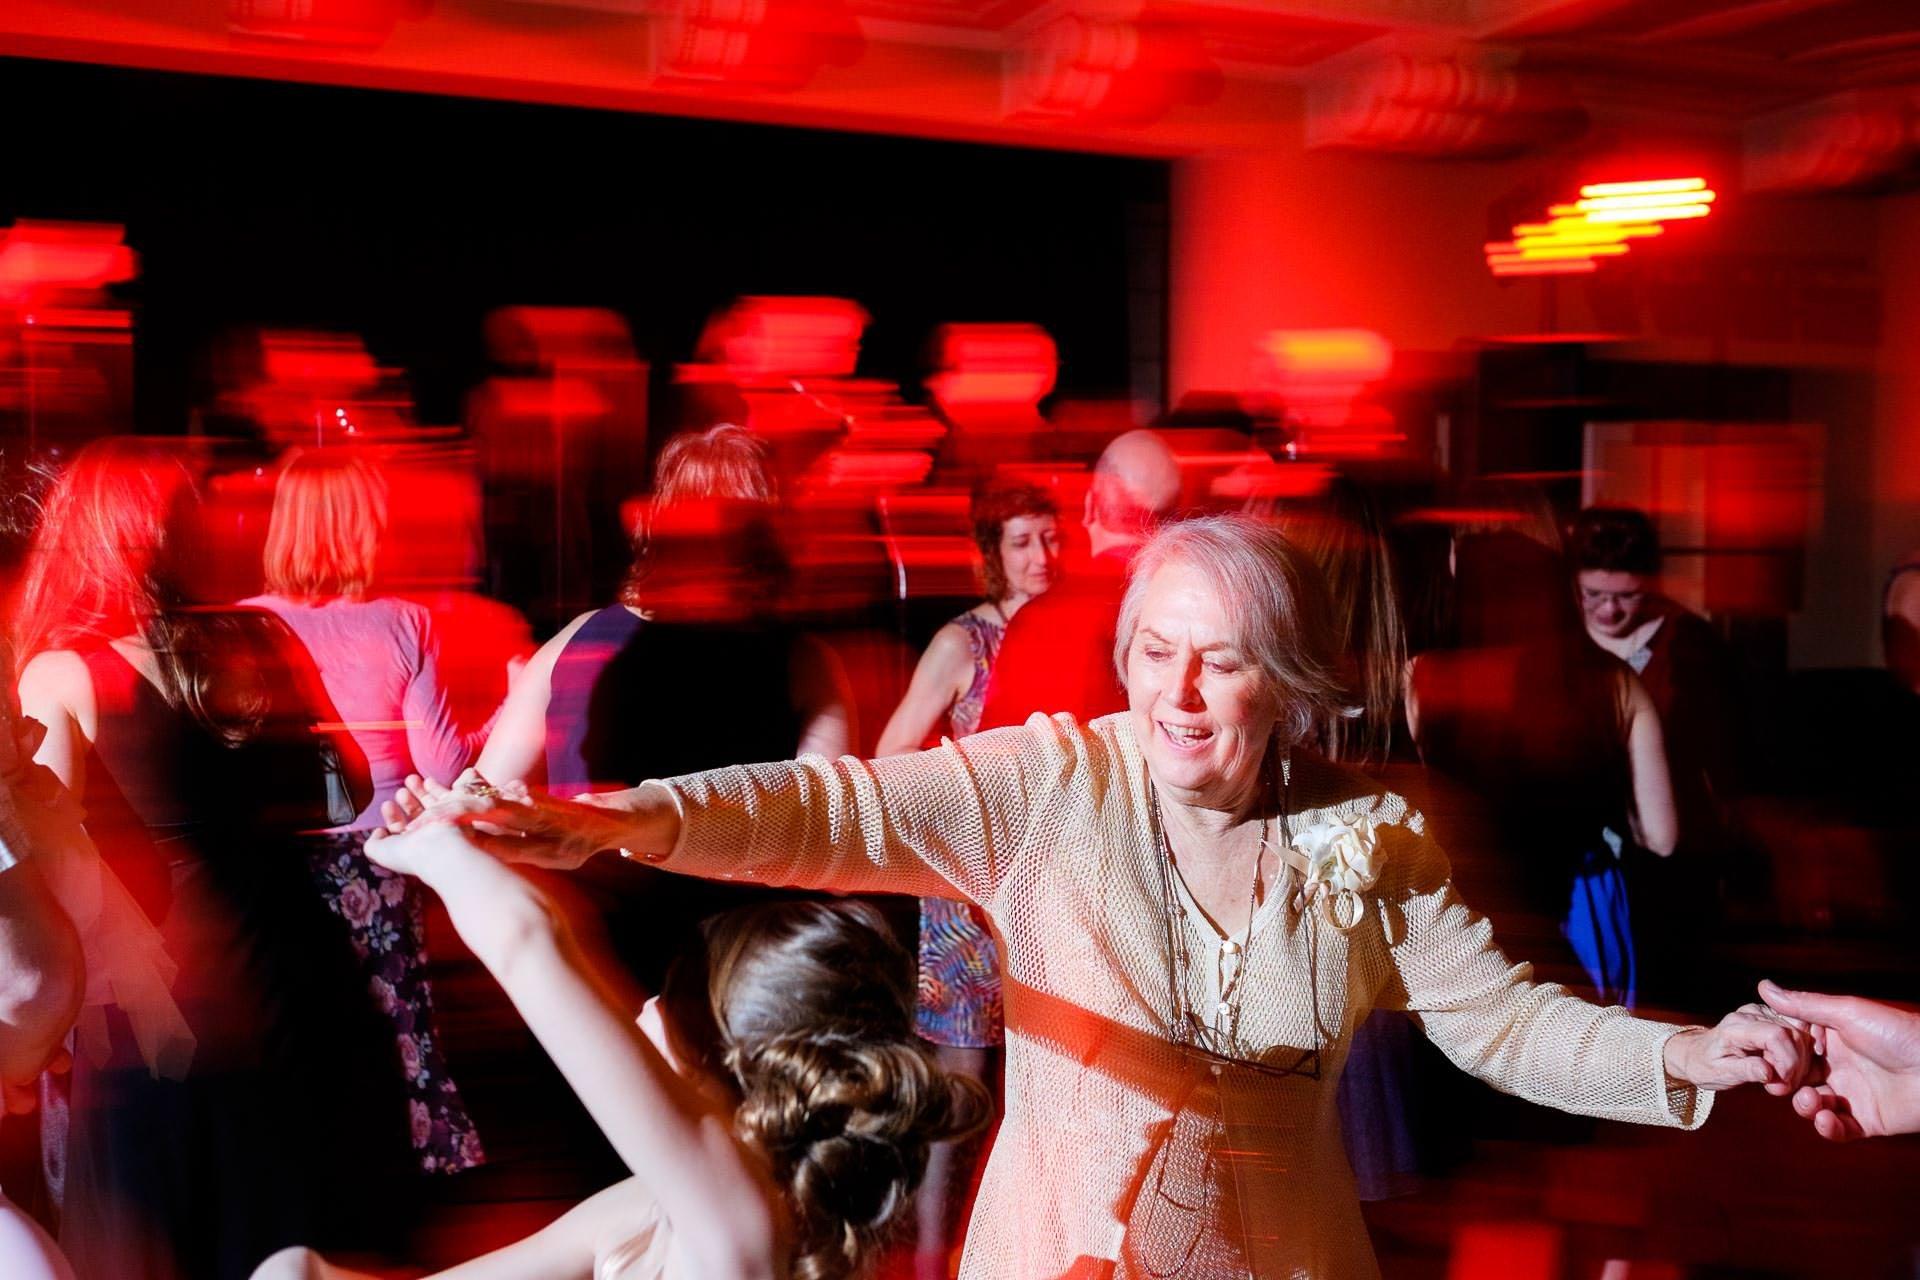 0075_KJFSaint-Paul-Athletic-Club-Wedding-Reception